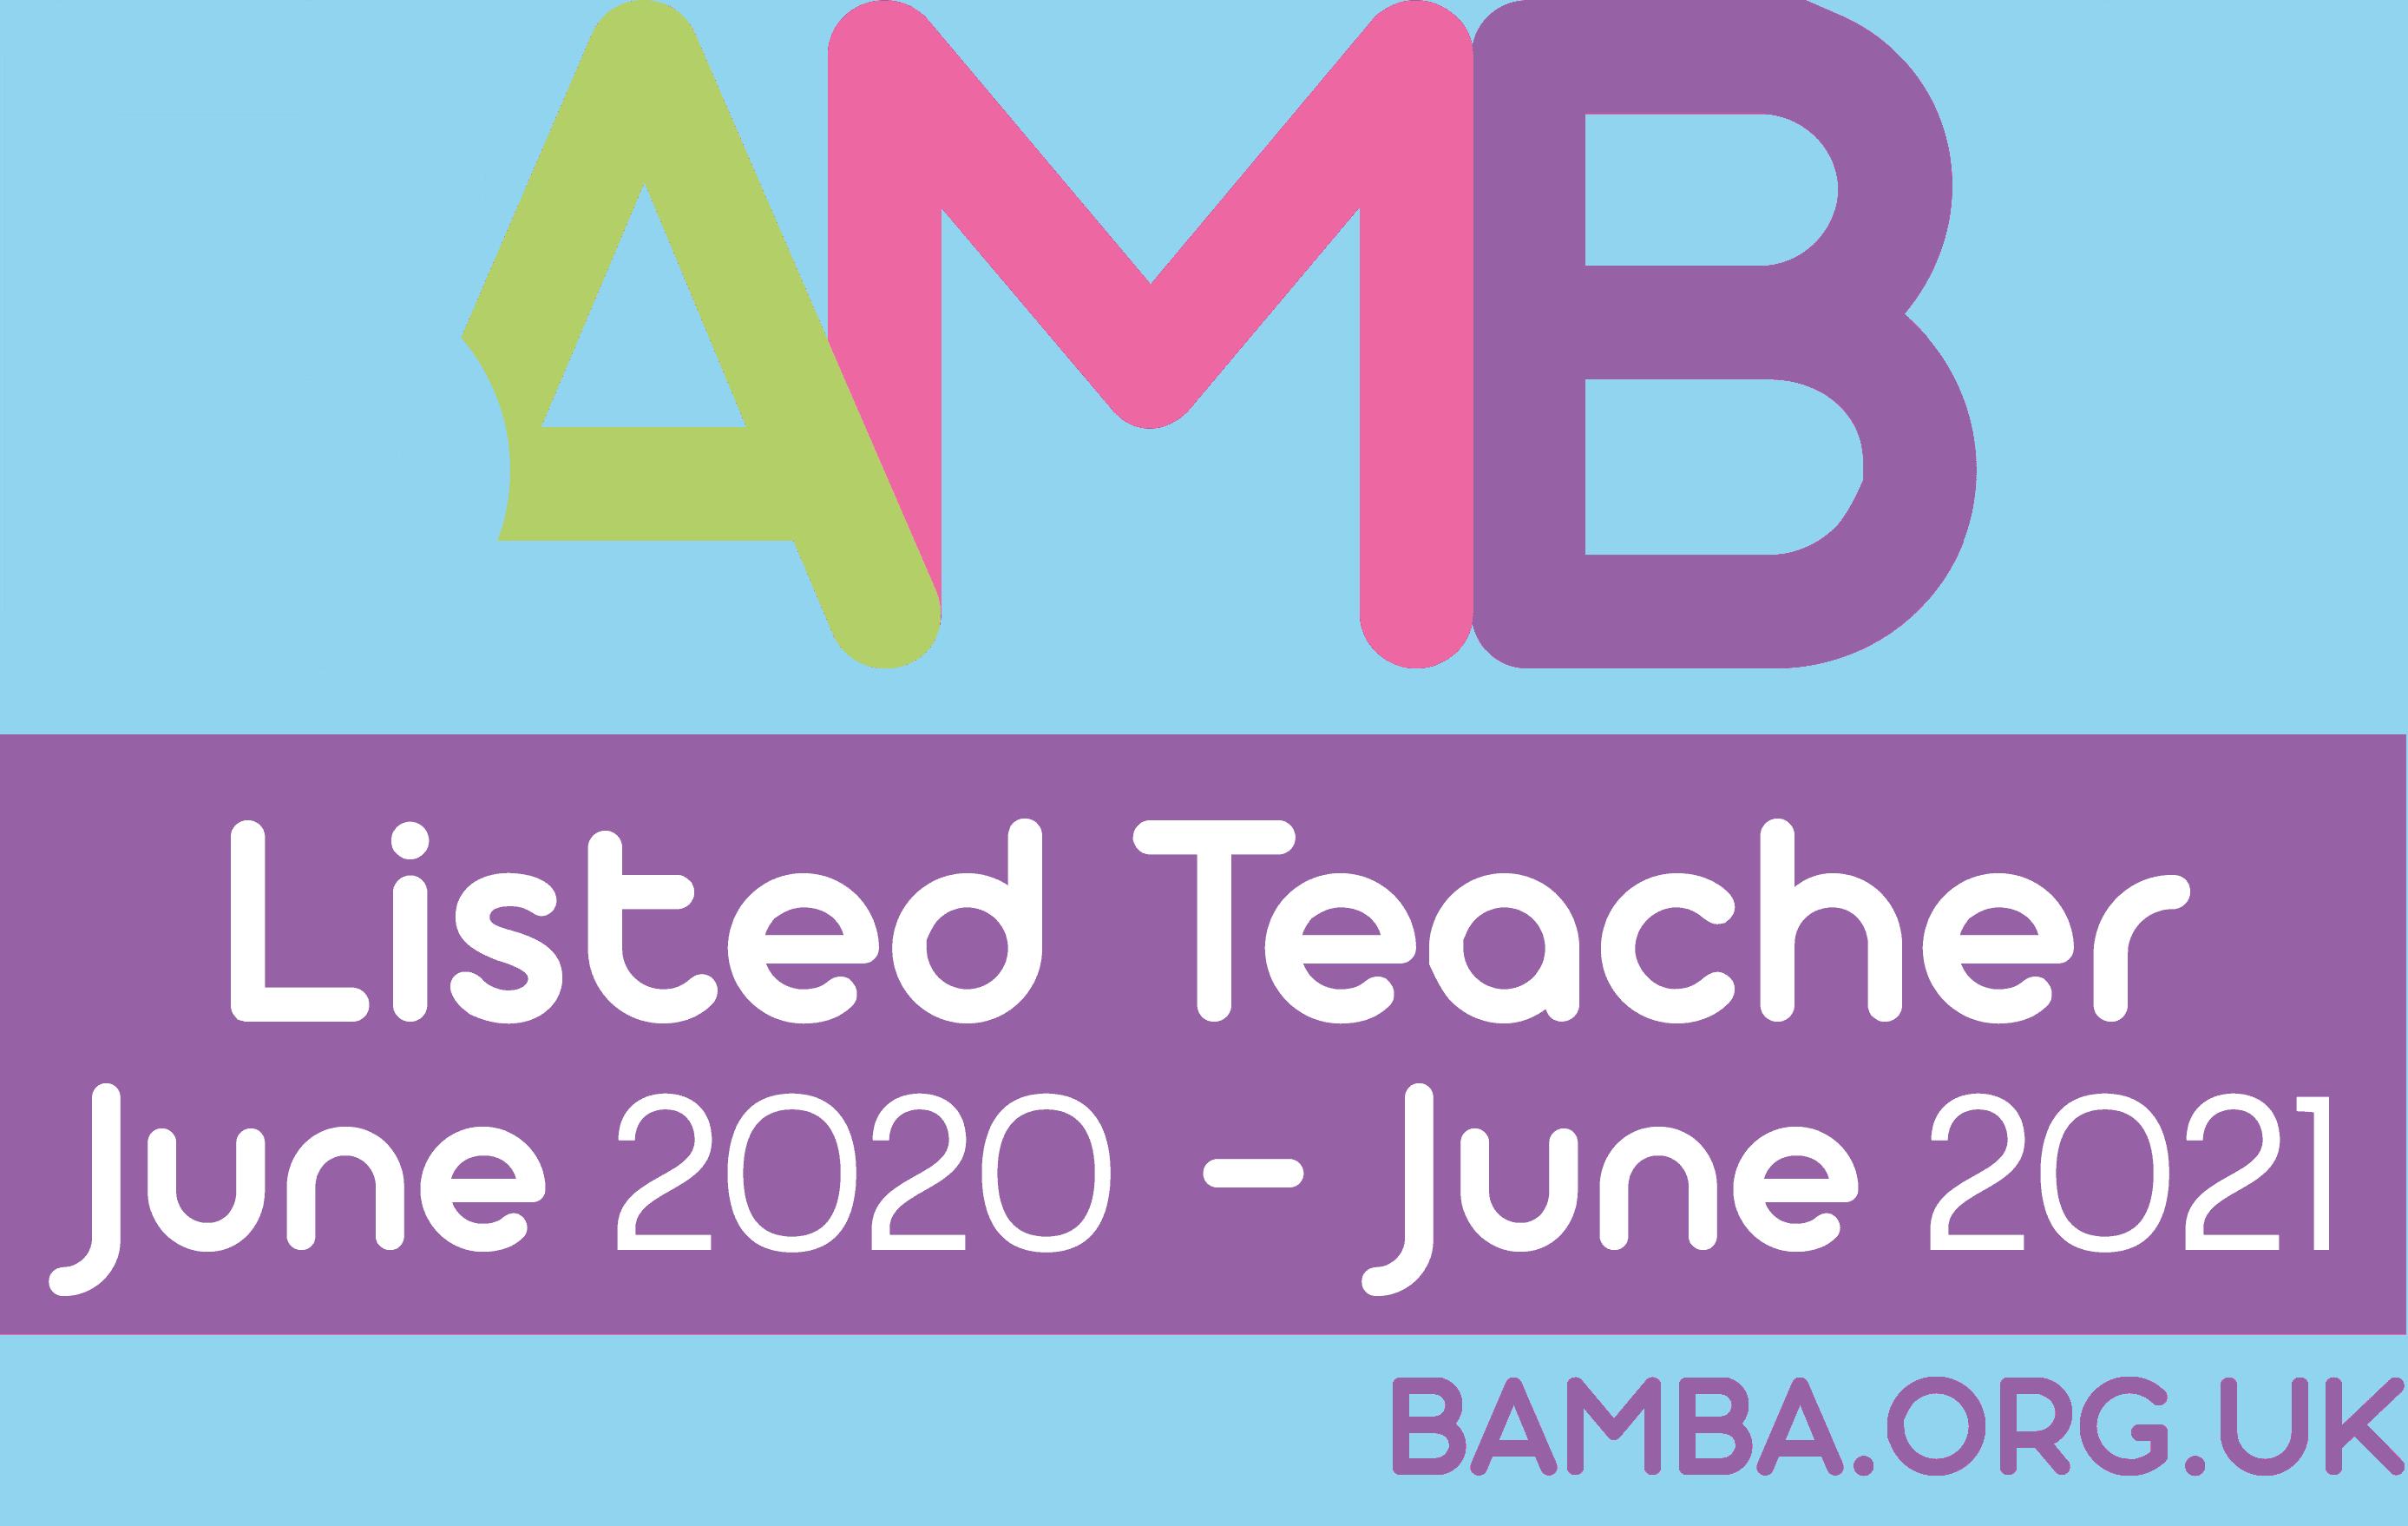 Bamba Jun 2020 - 2021